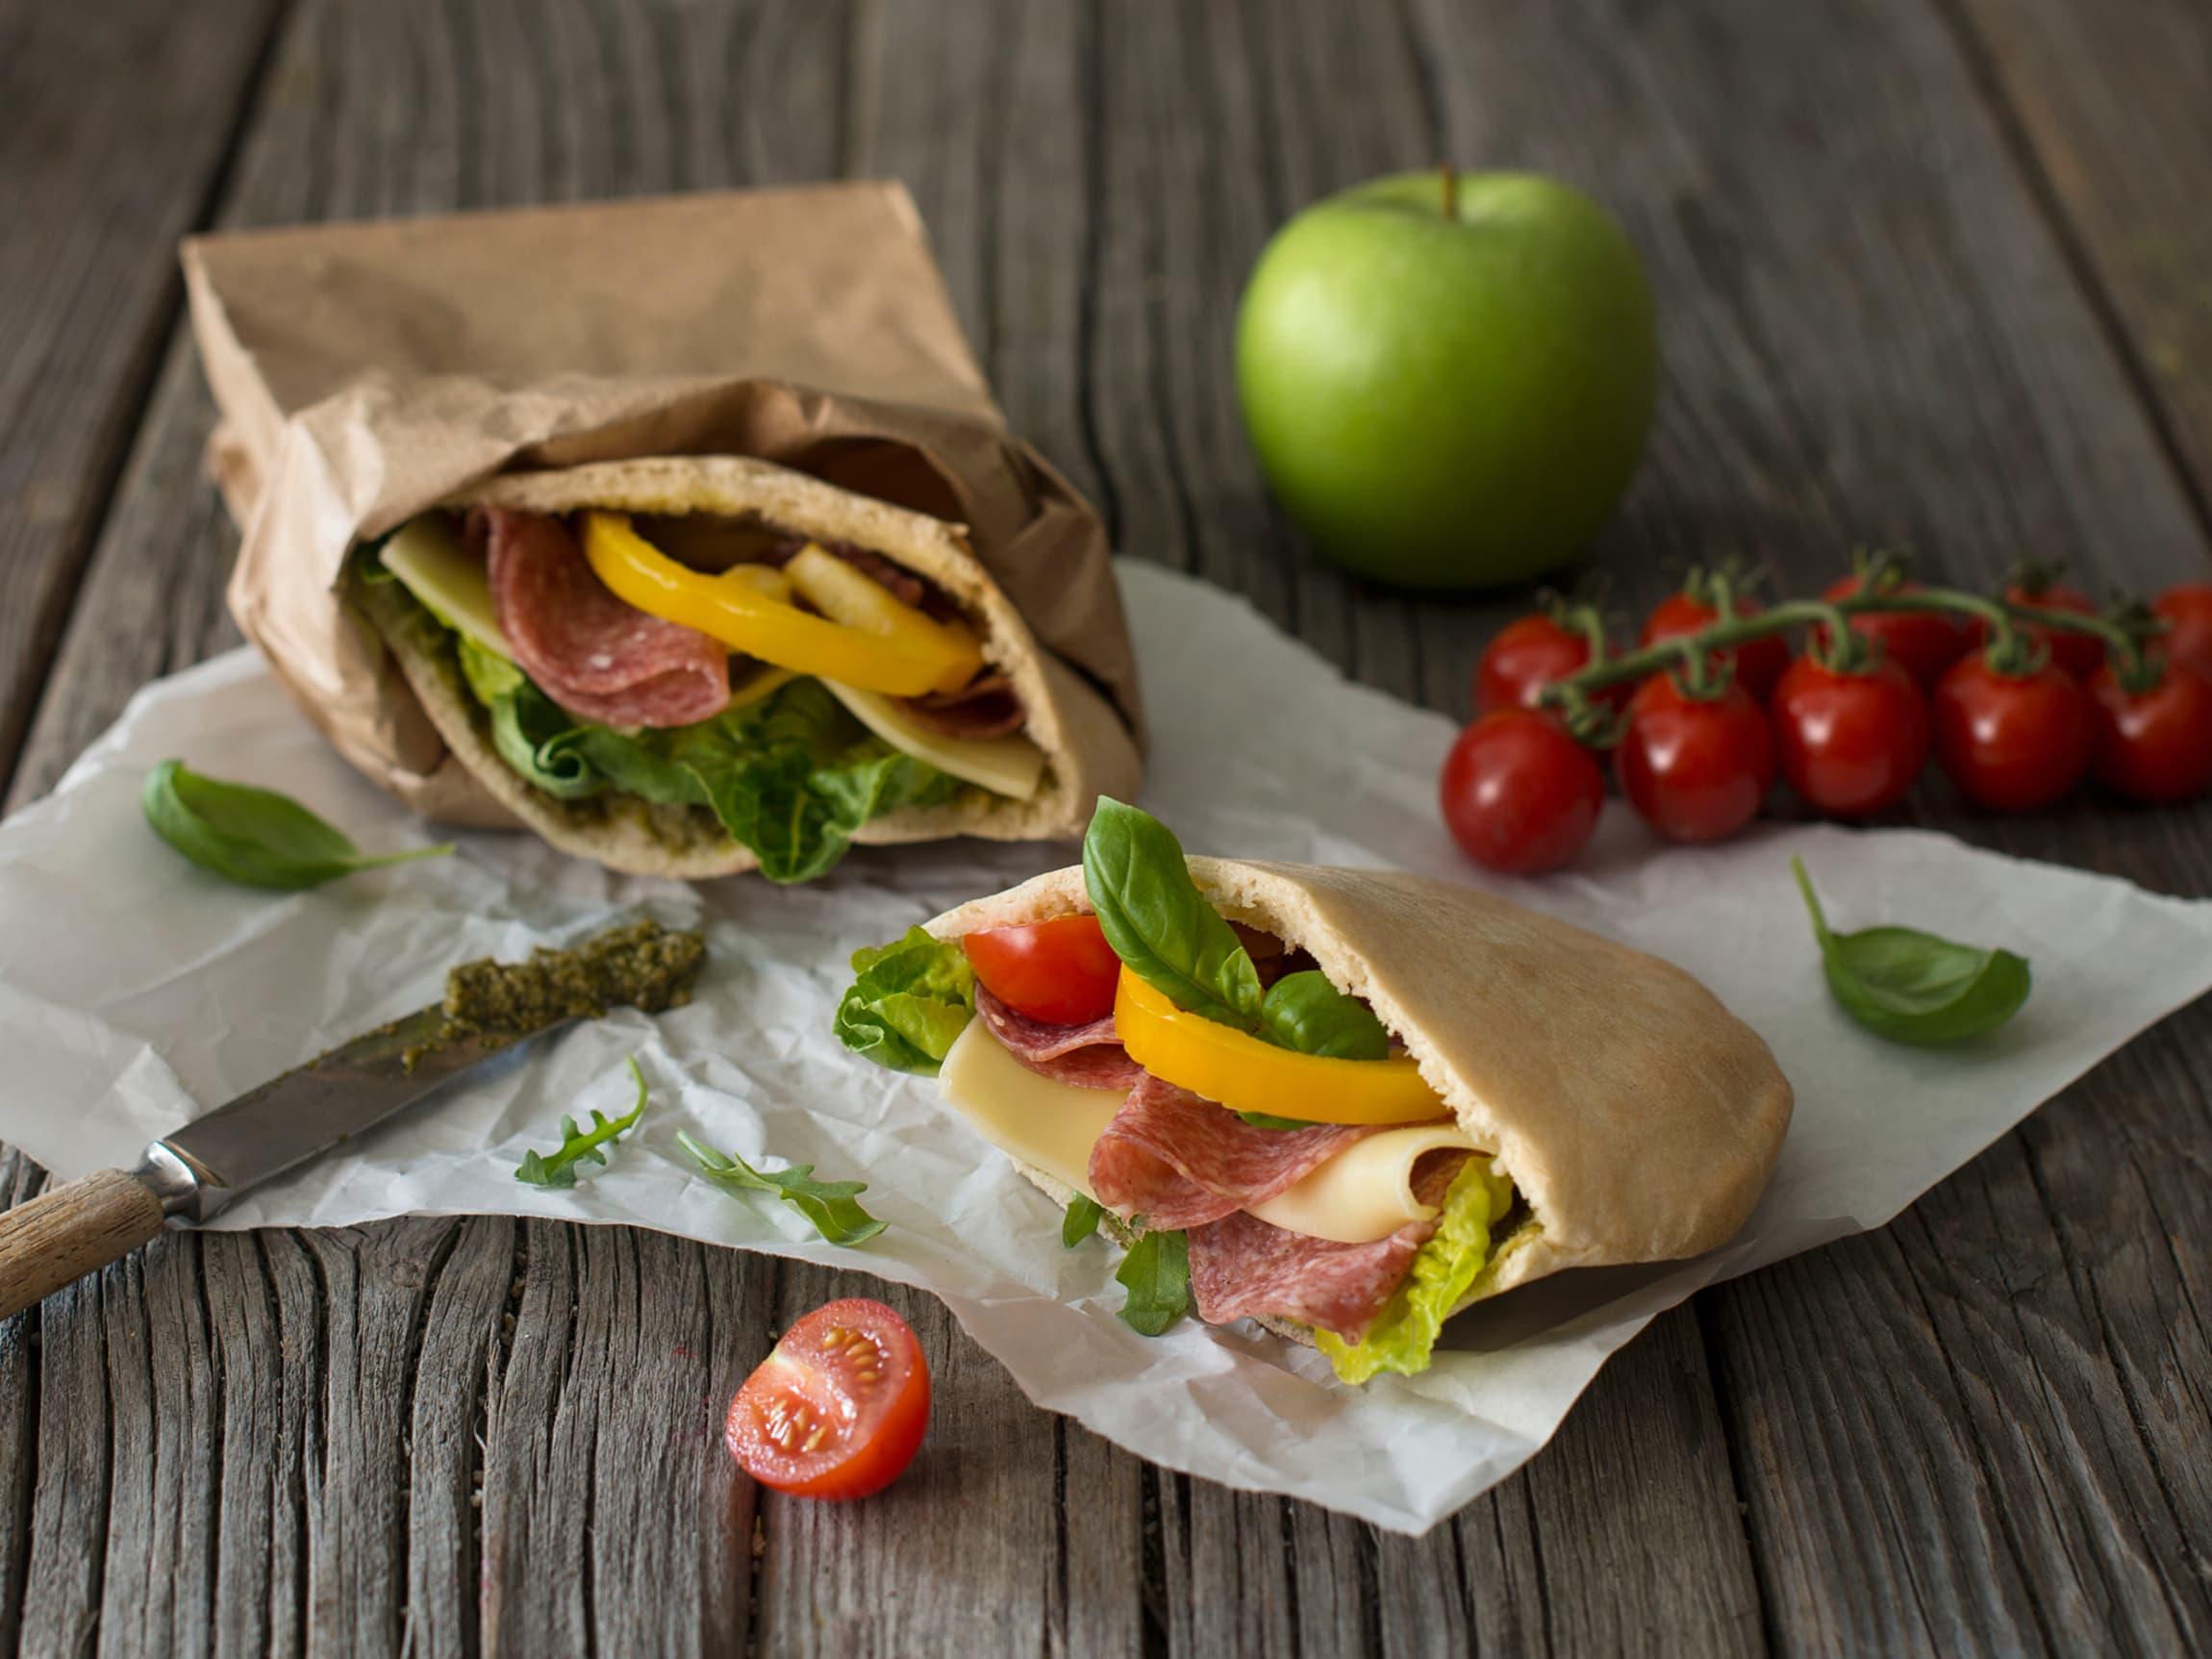 Pitabrød med salami og gulost er perfekt i matboksen.